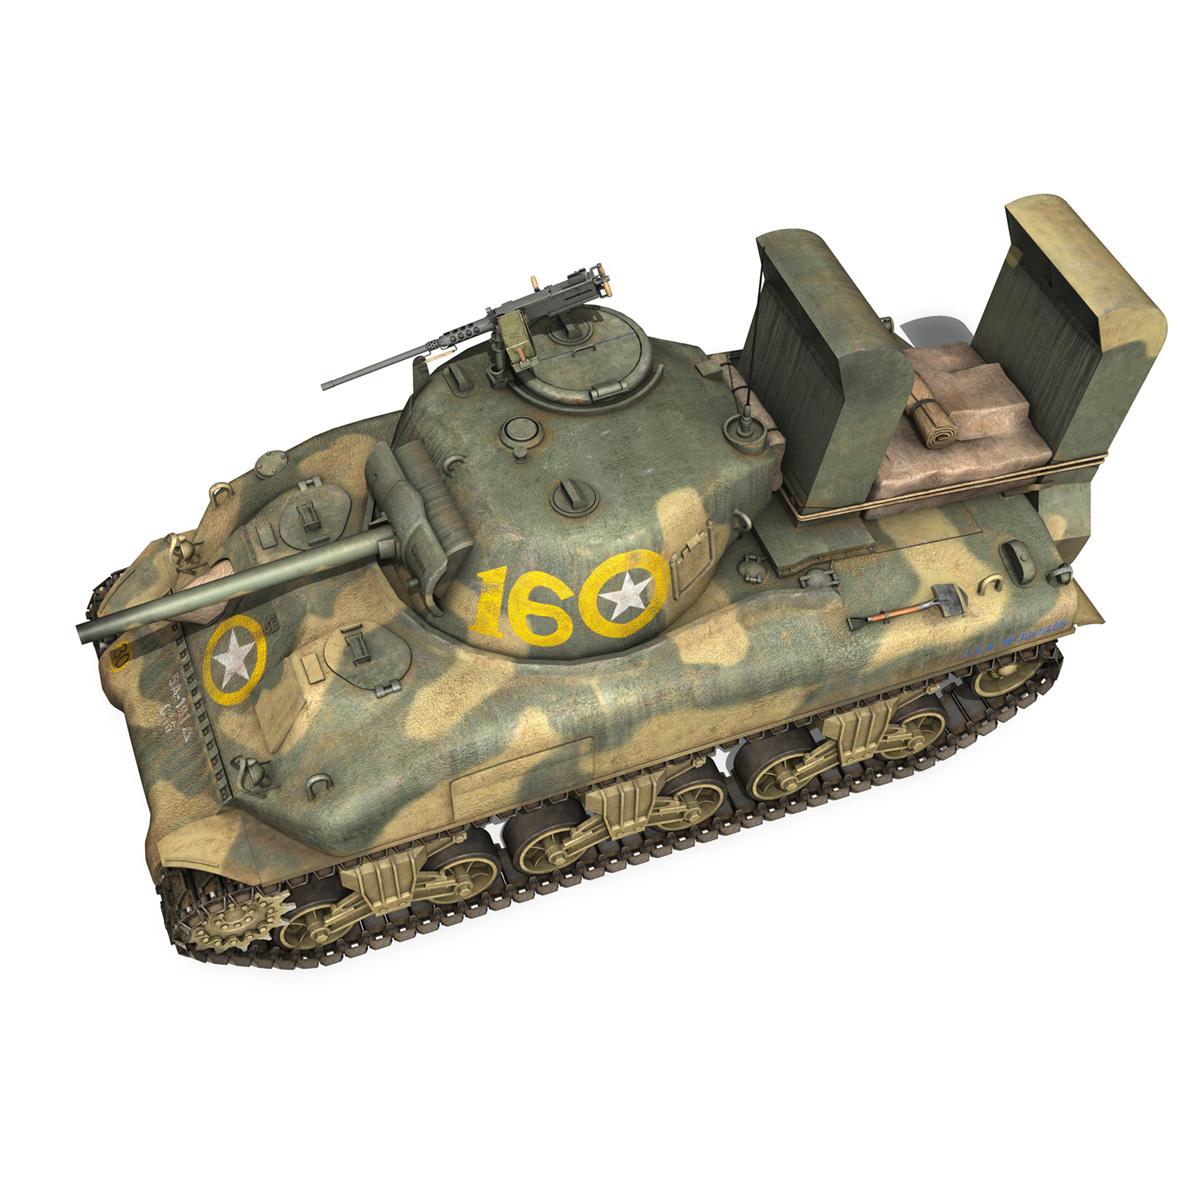 M4A1 Sherman - 16 3d model 3ds fbx c4d lwo lws lw obj 273058